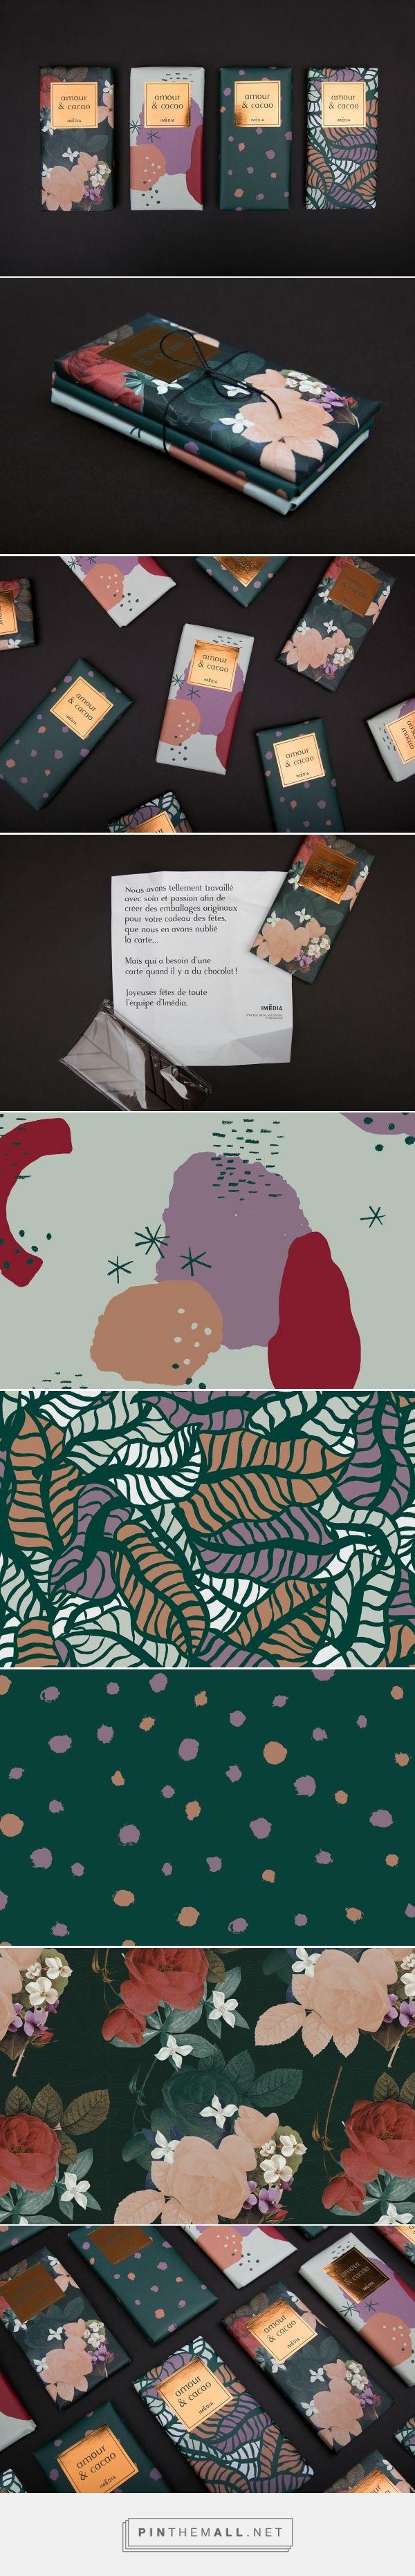 Amour & cacao by Marie-Joëlle Lemire, Imédia Firme Créative, Valerie Pilotte